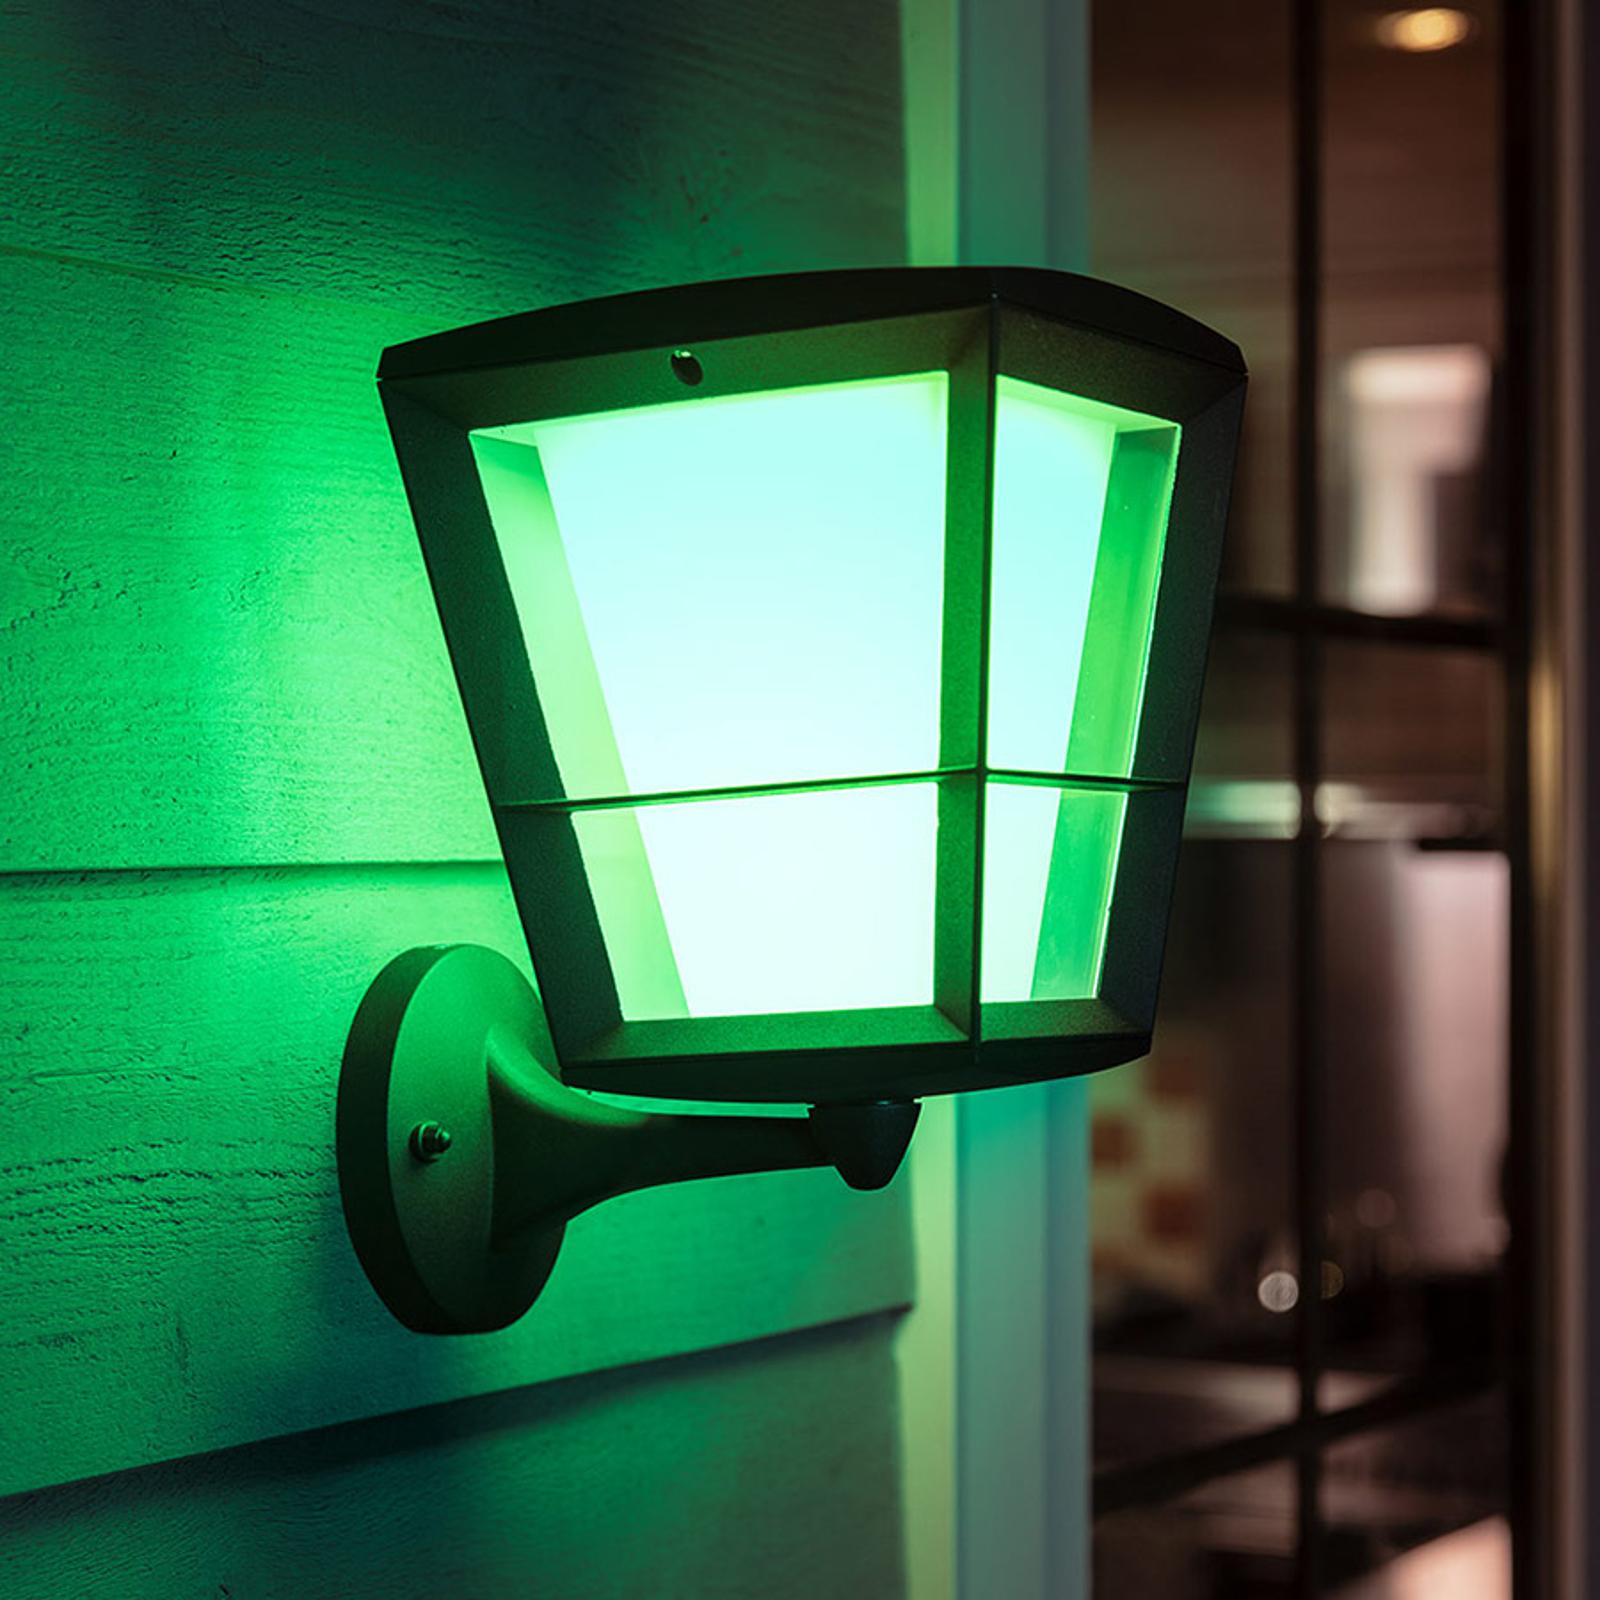 Philips Hue White+Color Econic Wandleuchte, oben